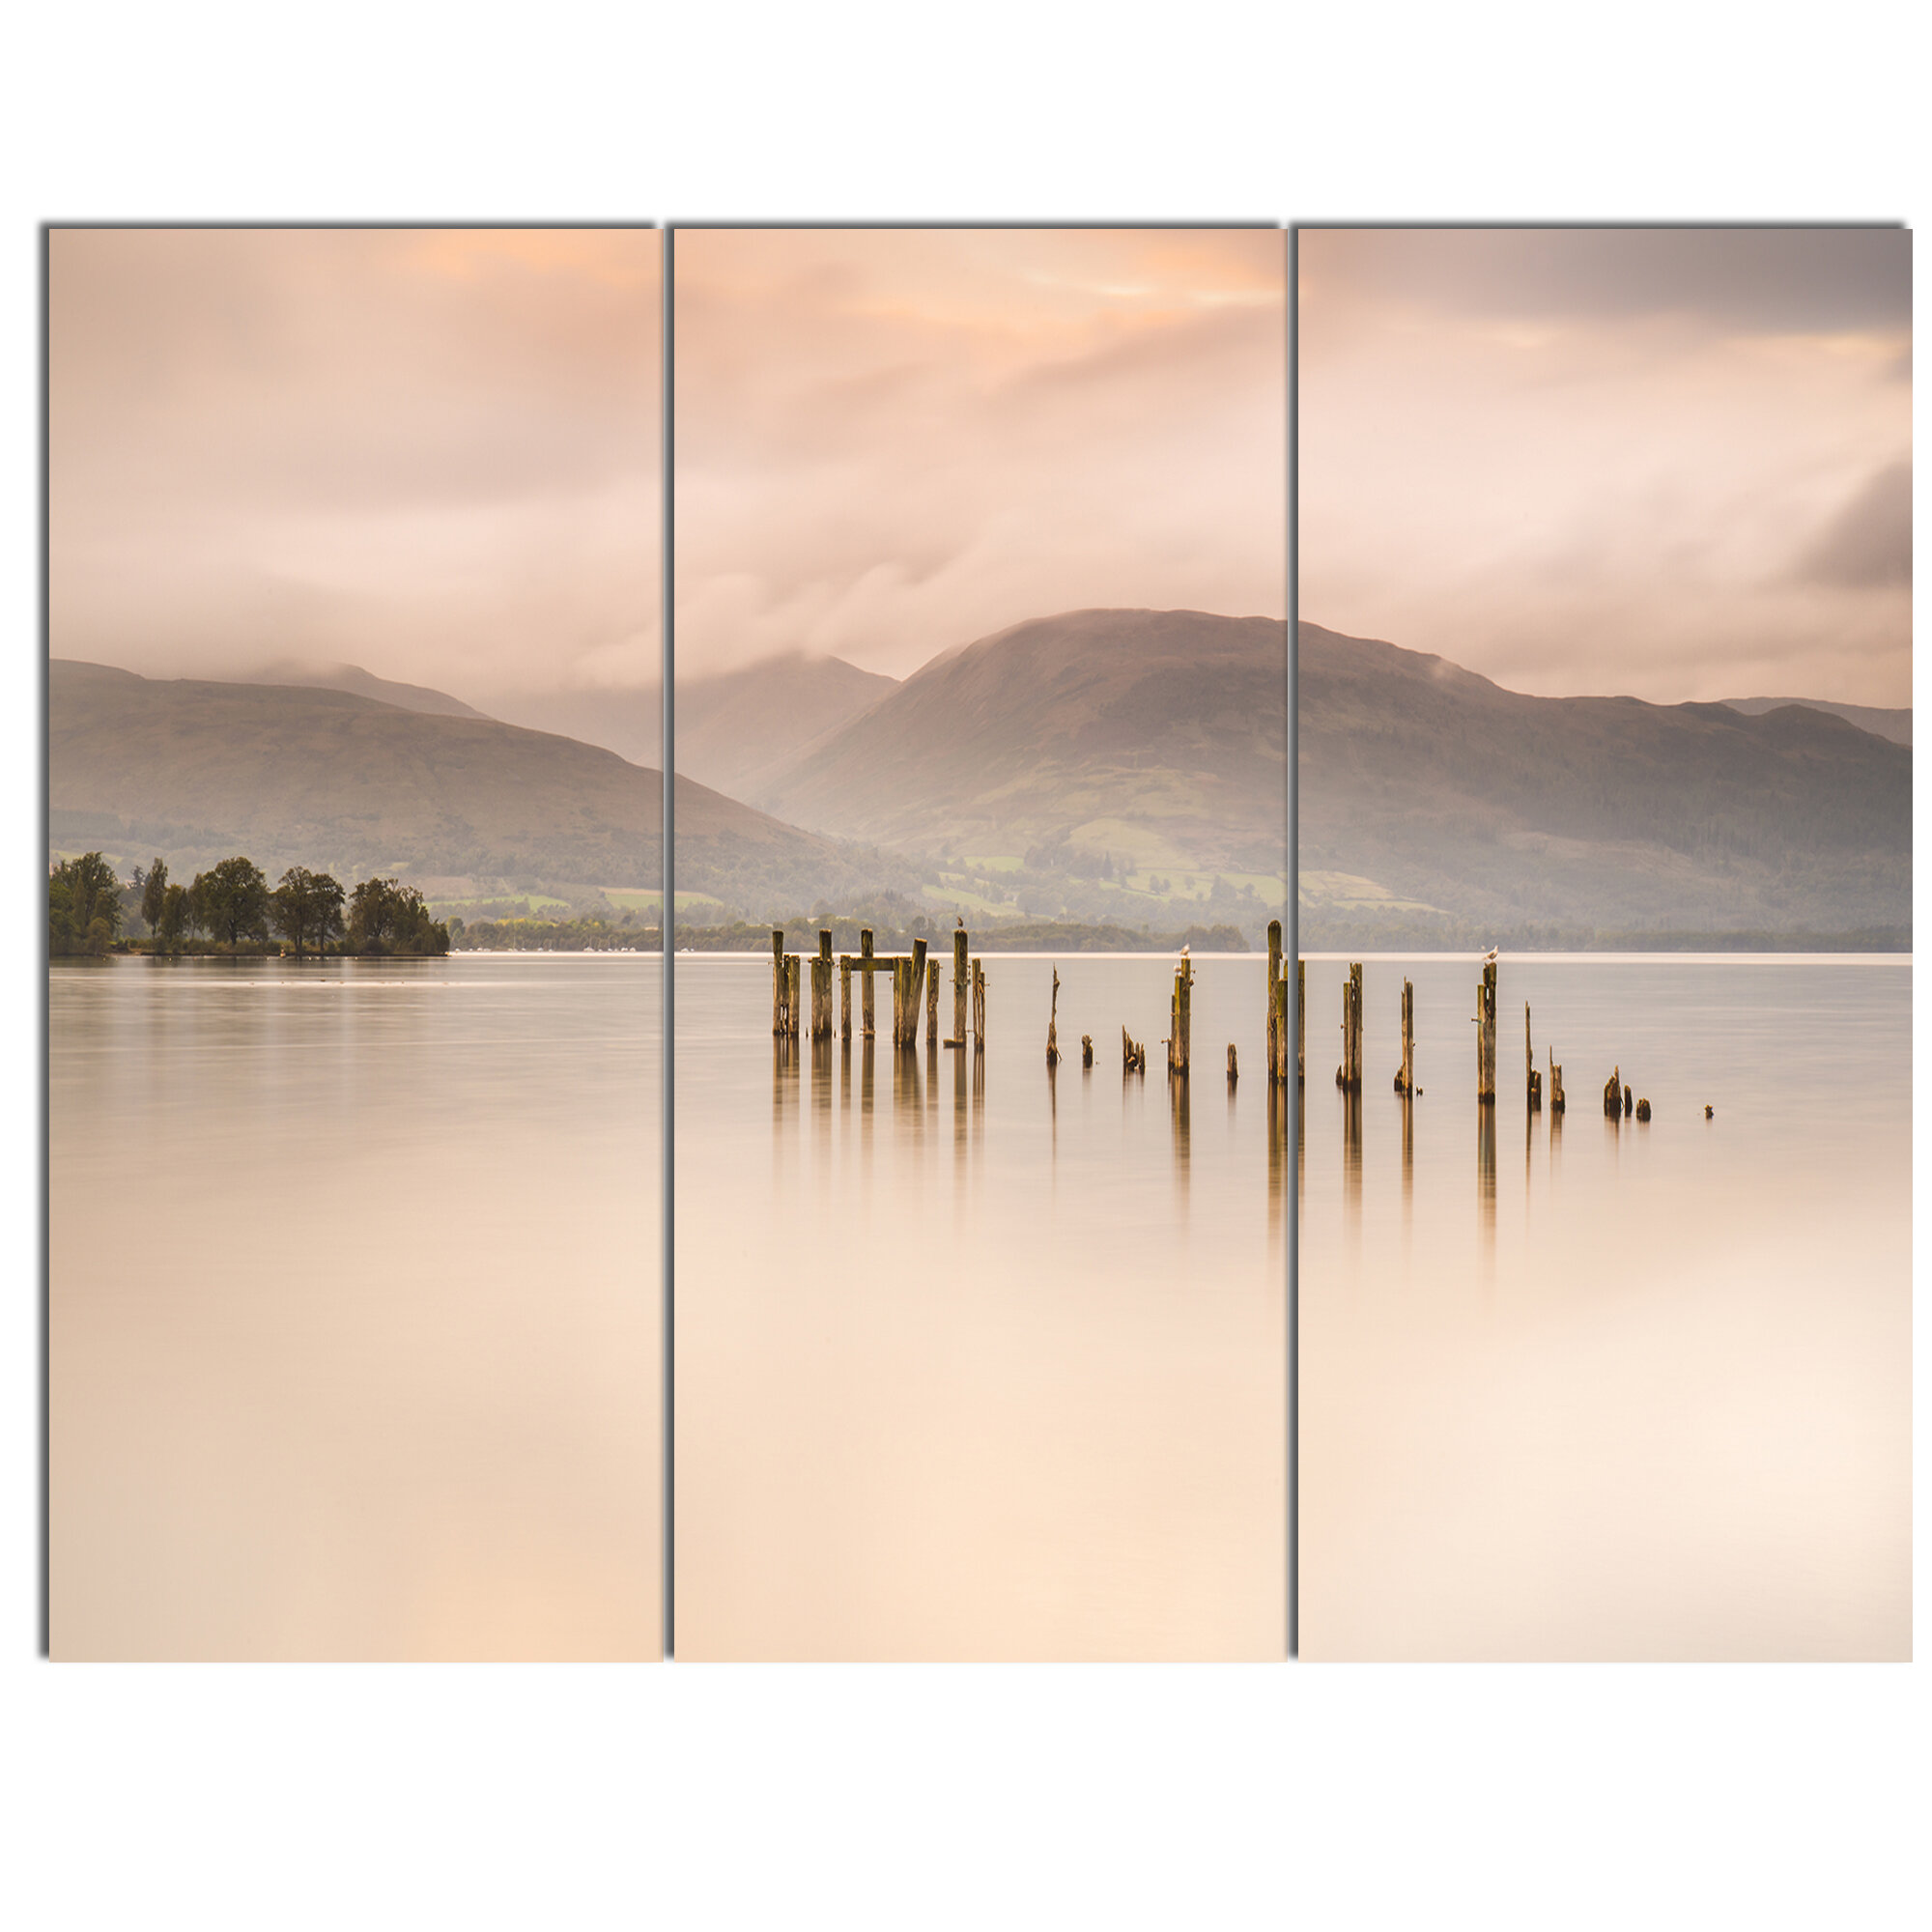 Designart Loch Lomond Jetty And Mountains 3 Piece Photographic Print On Metal Set Wayfair